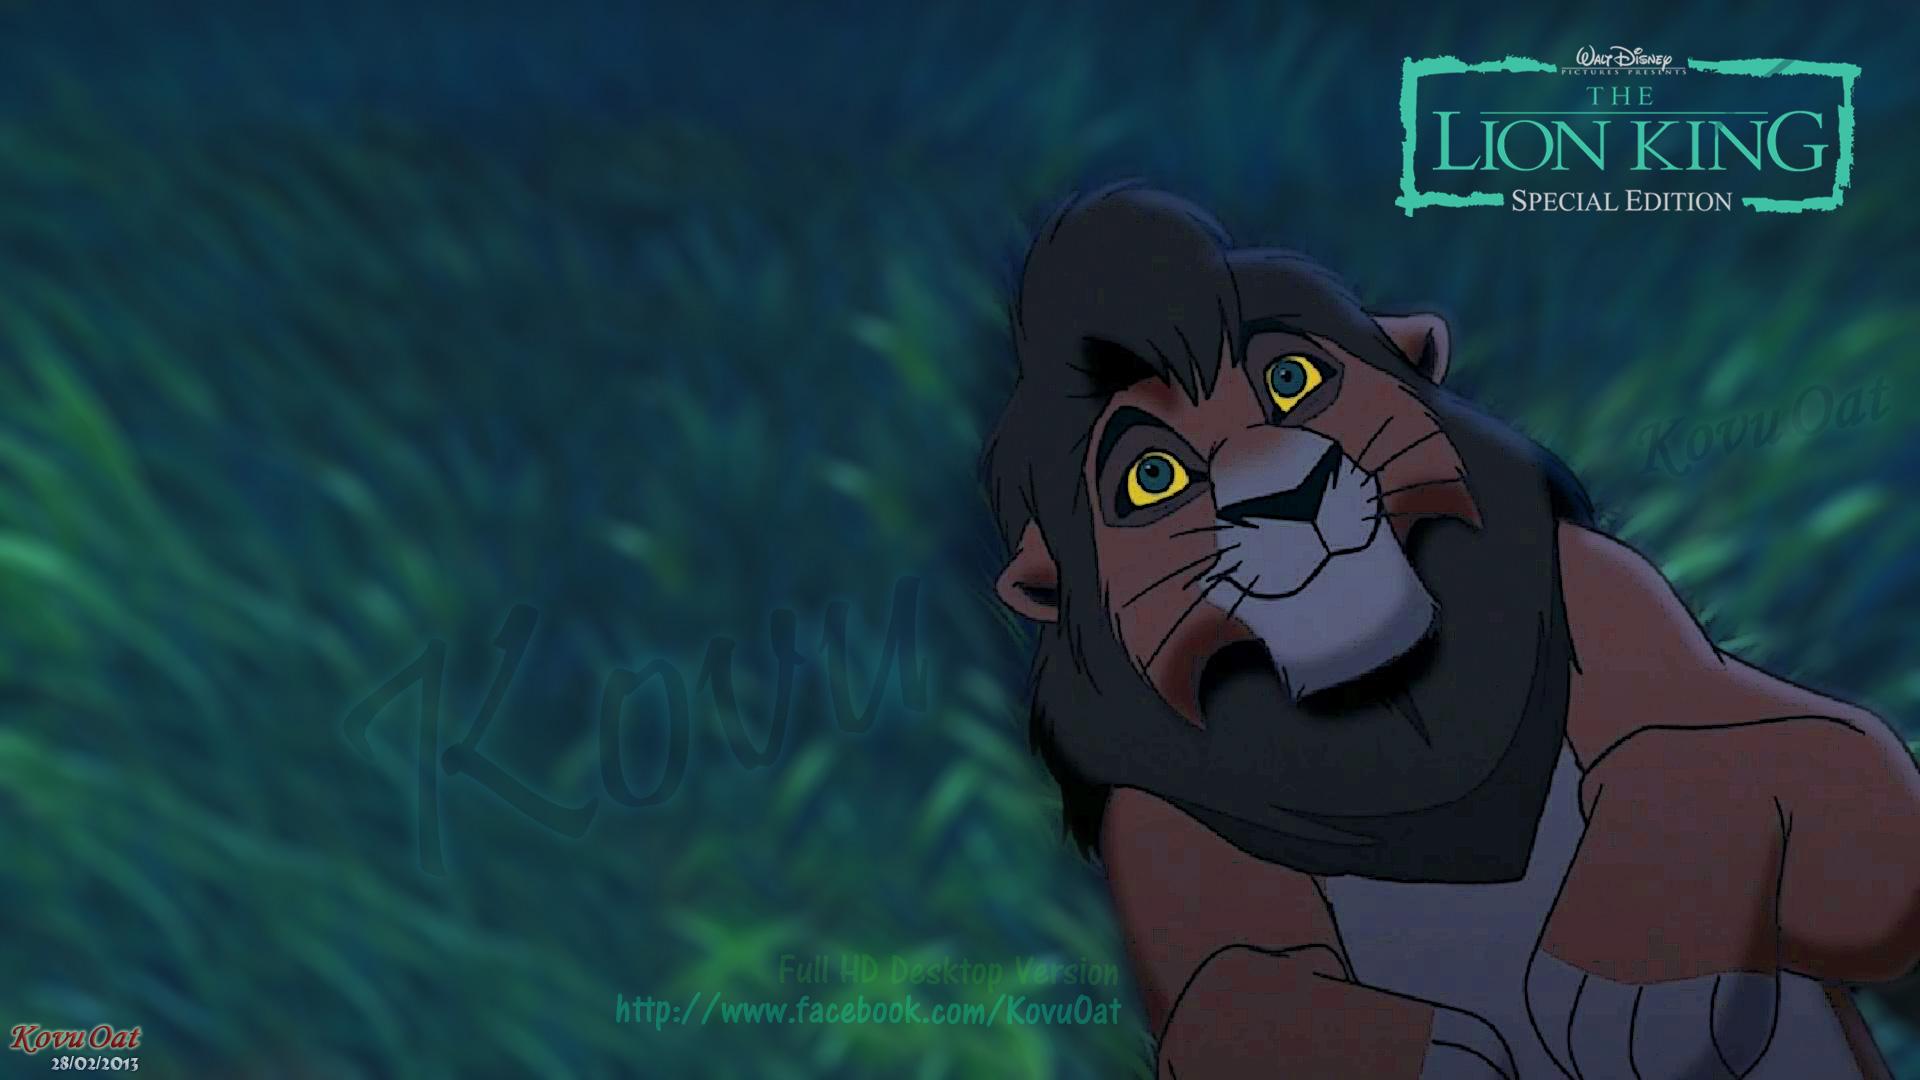 Kovu Oat Images Lion King Kovu Desktop Wallpaper Background Full Hd